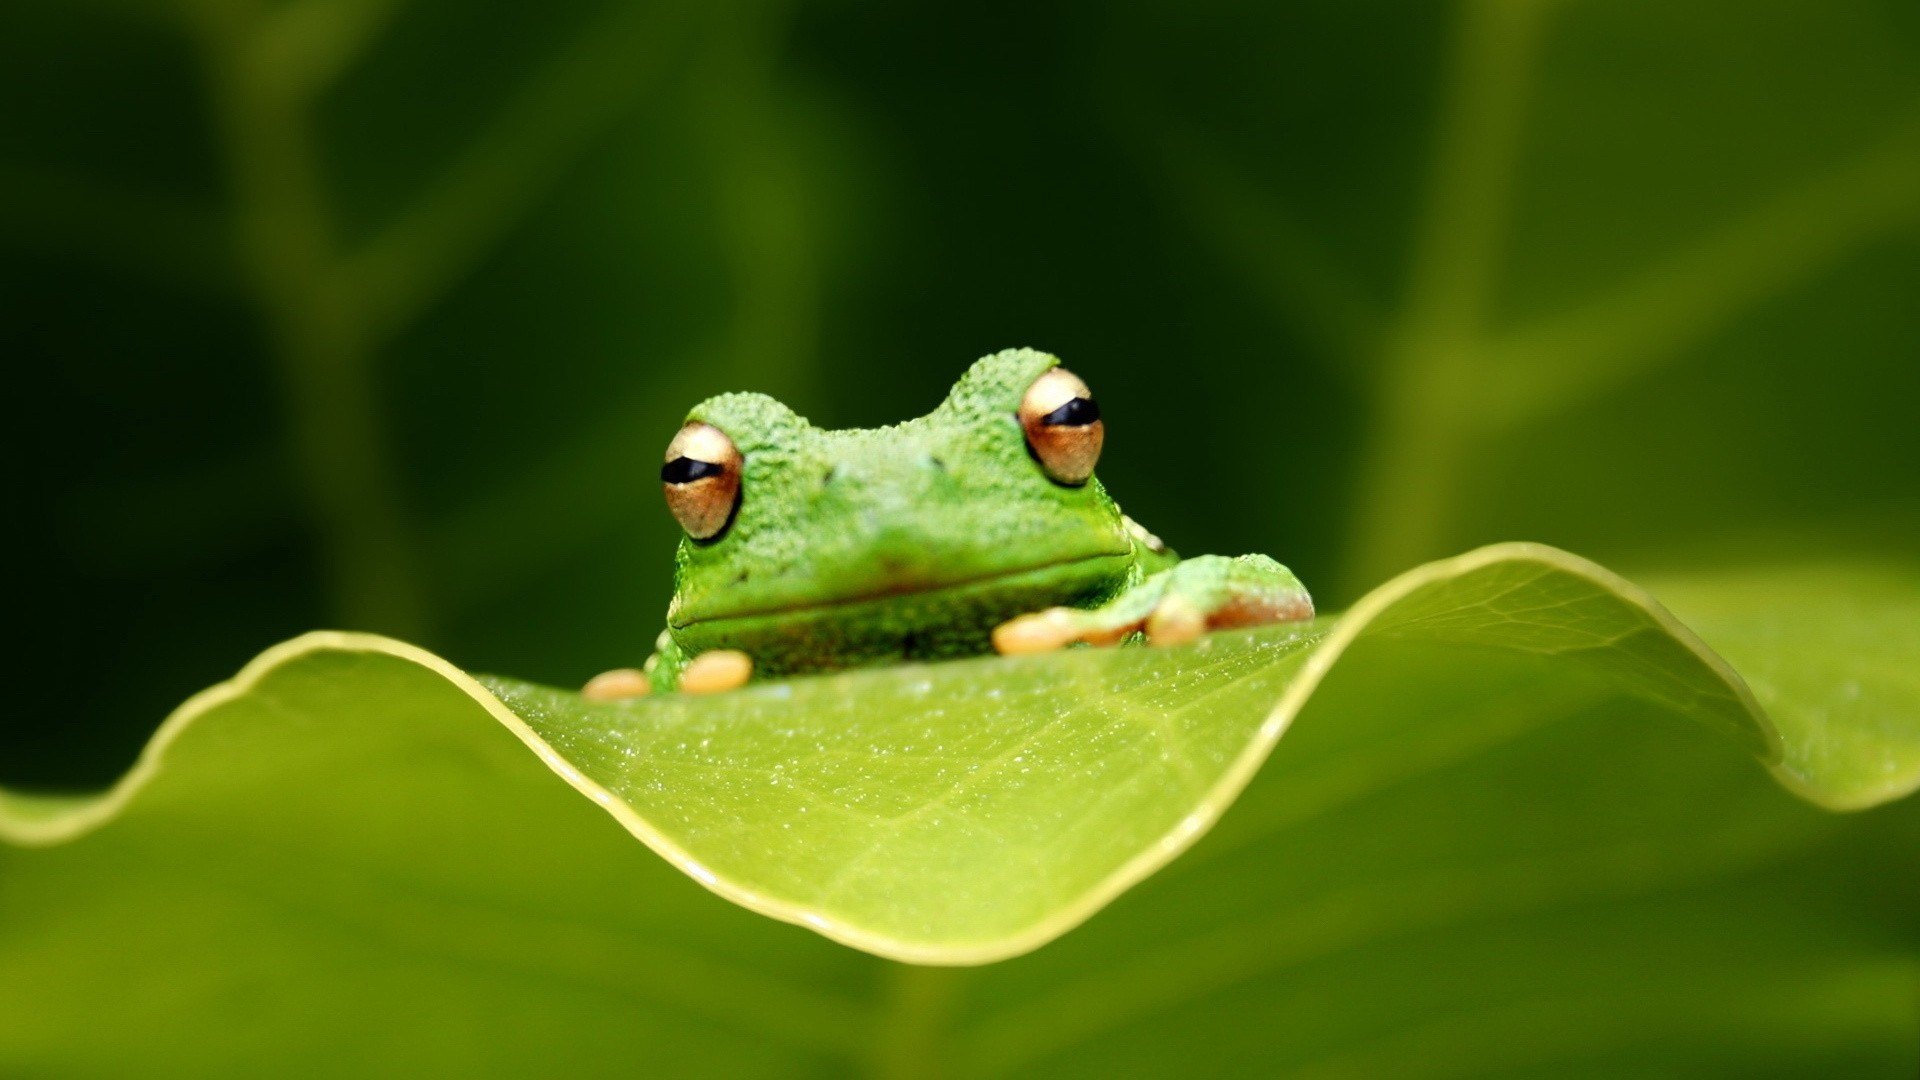 Frog HD Wallpaper